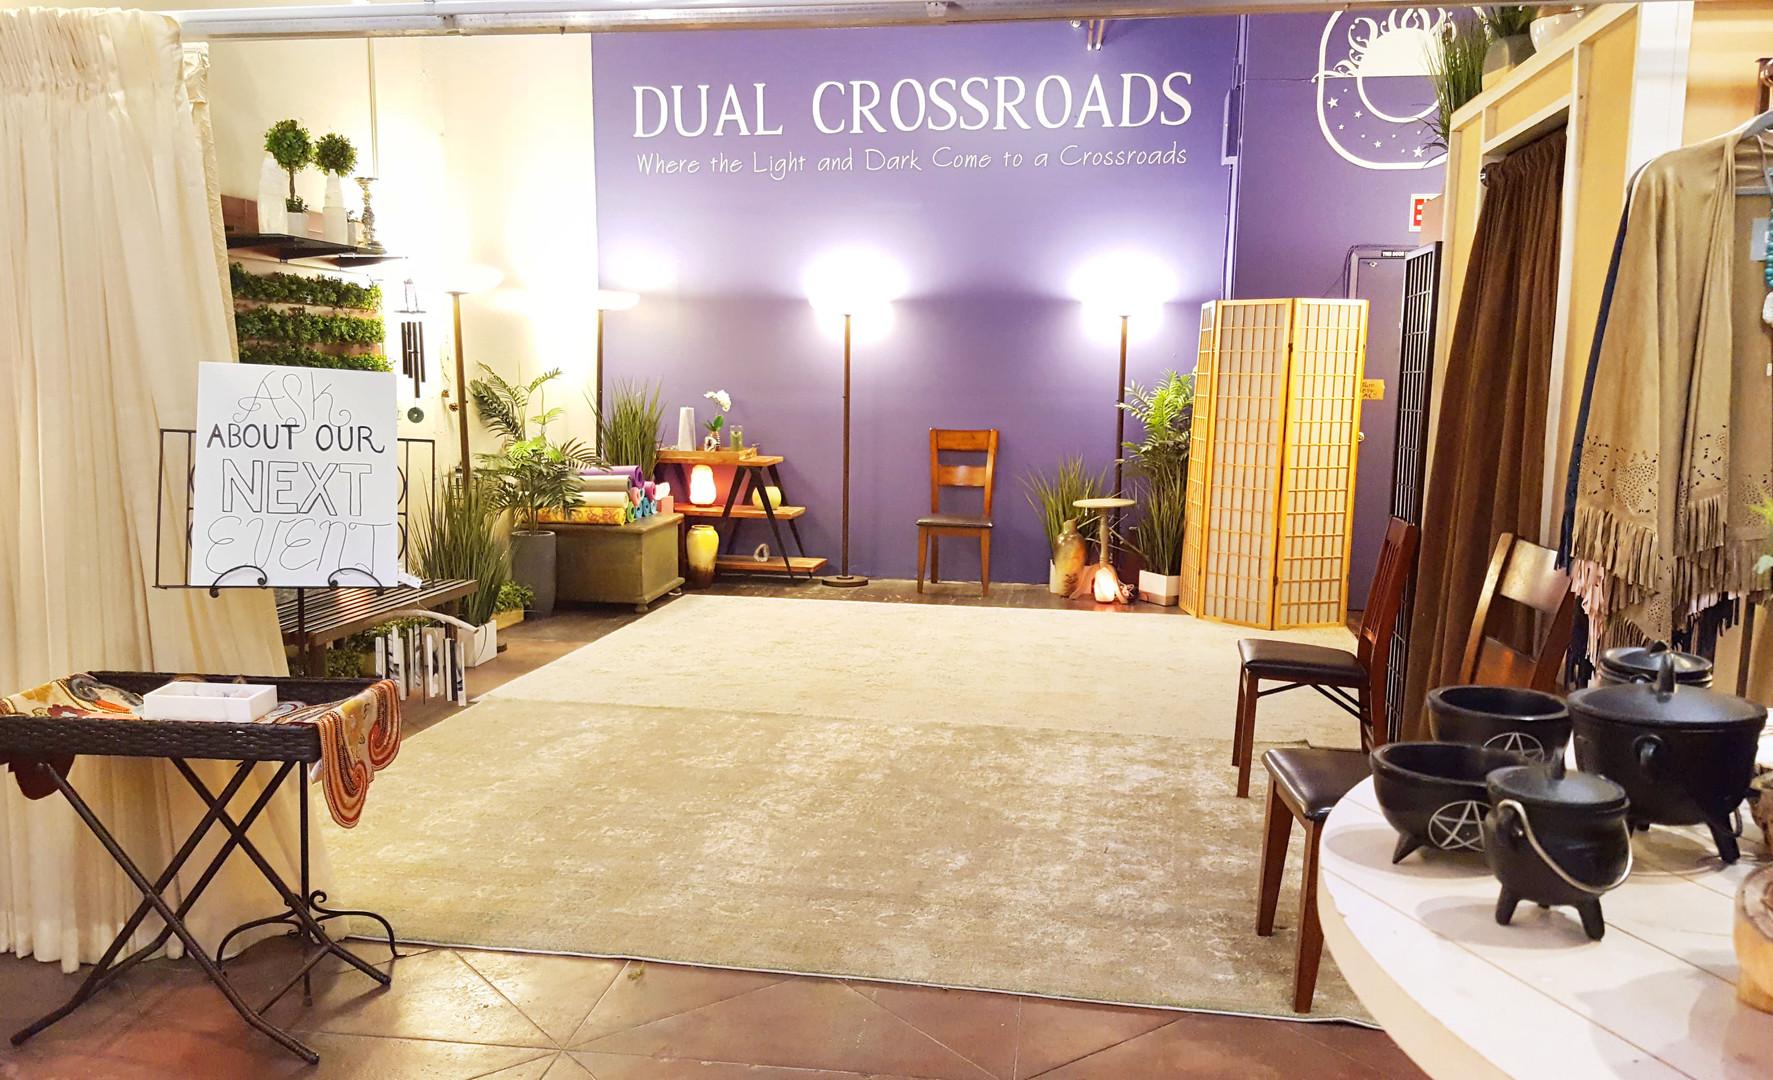 Dual Crossroads Back of Store